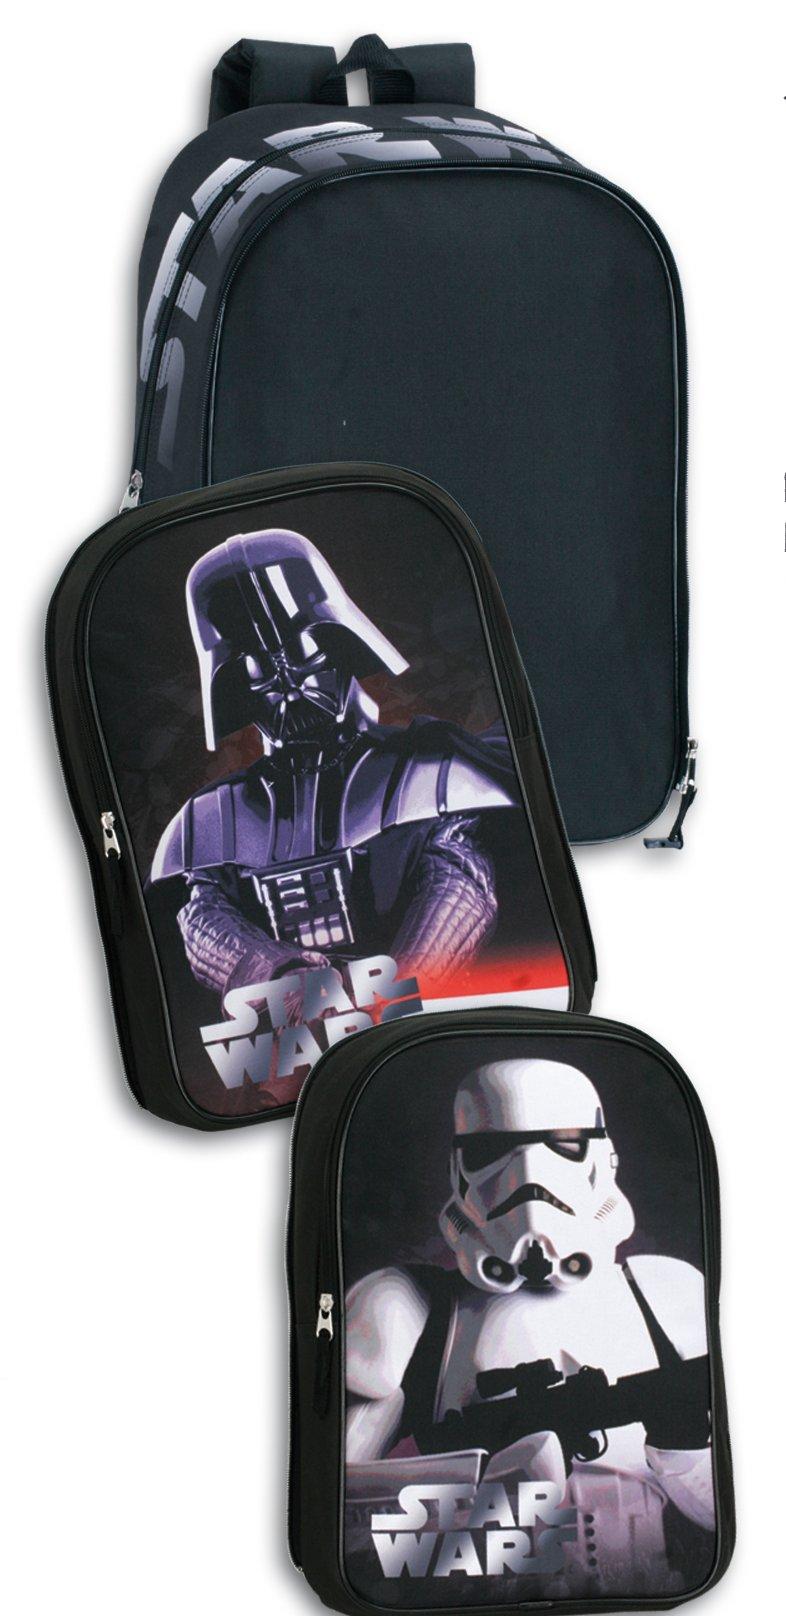 4e0ef91d7cb Τσάντα με αλλαγή μπροστινή θήκη Star Wars | ToysForKids e-shop